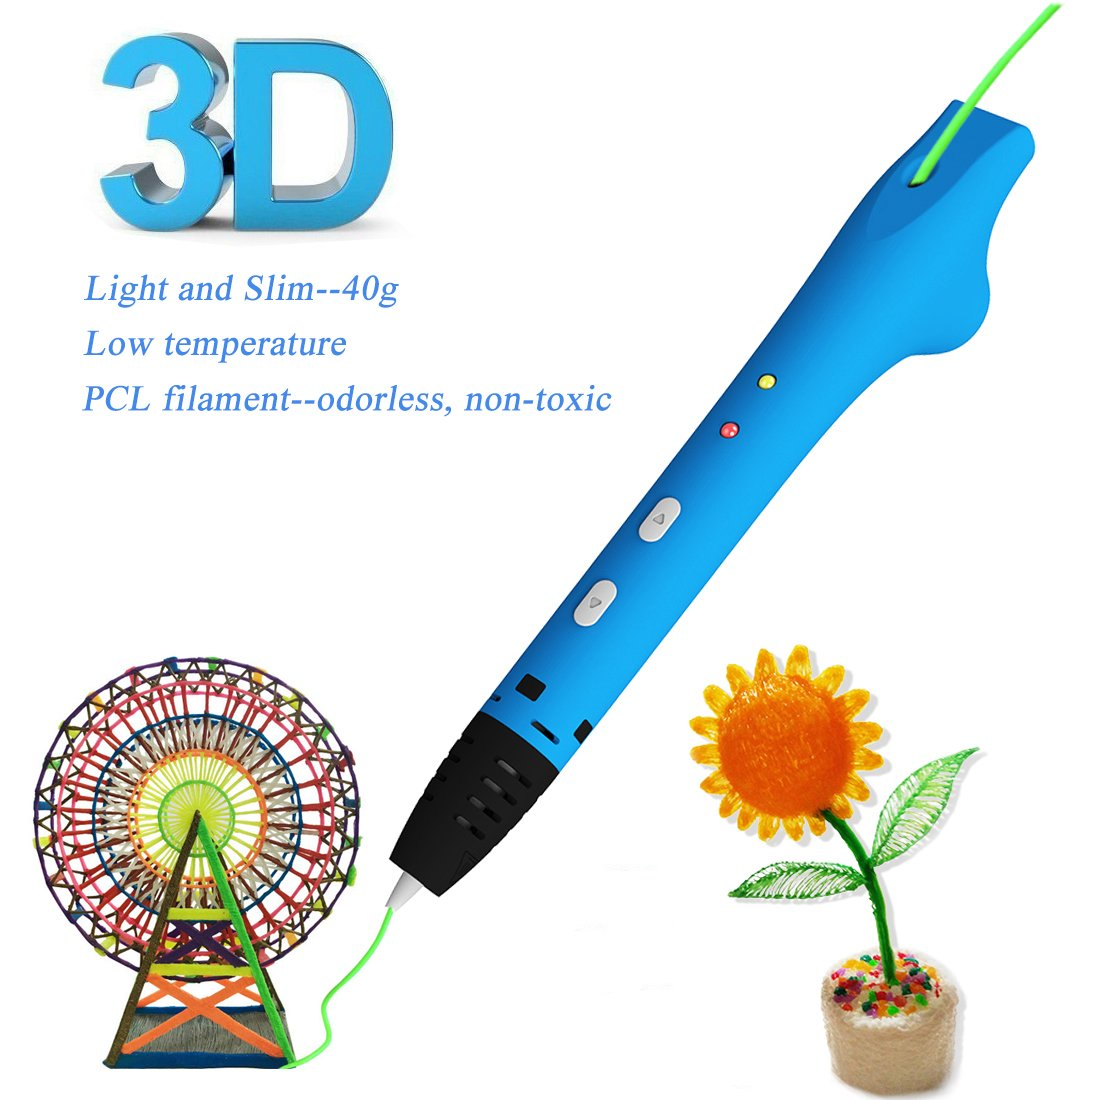 GOOAnn New Upgraded 3D Pen, 3D Printing Pen Compatible with 1.75mm Low Temperature PCL filament, 3D Doodle Drawing Pen, No Clog, 3D Art Crafts DIY or Education Creation Printer Pen for Kids (Blue)